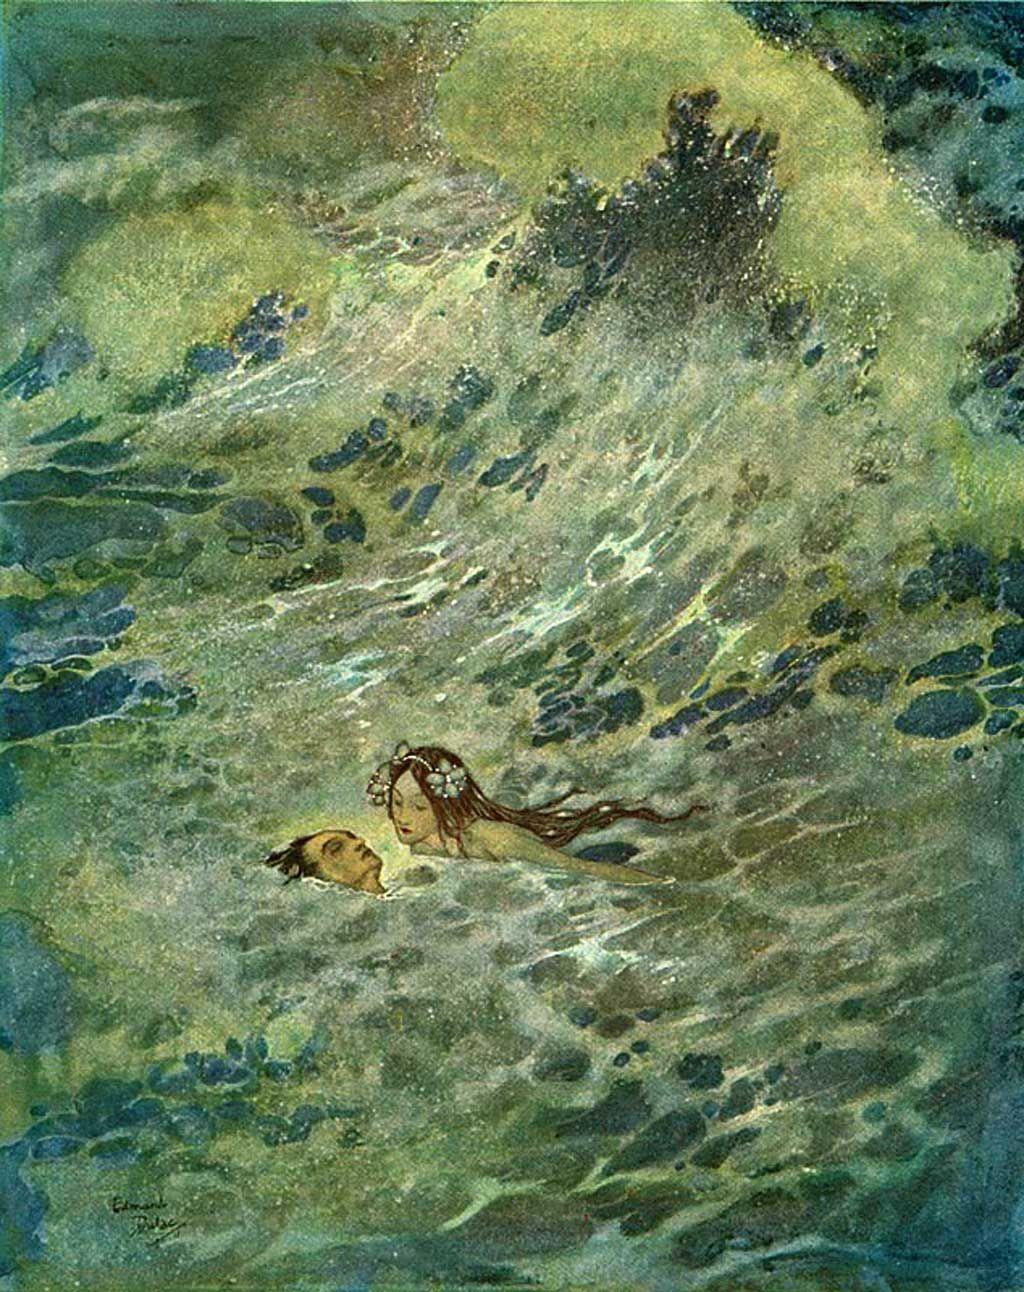 Edmund_Dulac_-_The_Mermaid_-_in_the_sea.jpg (1024×1292)